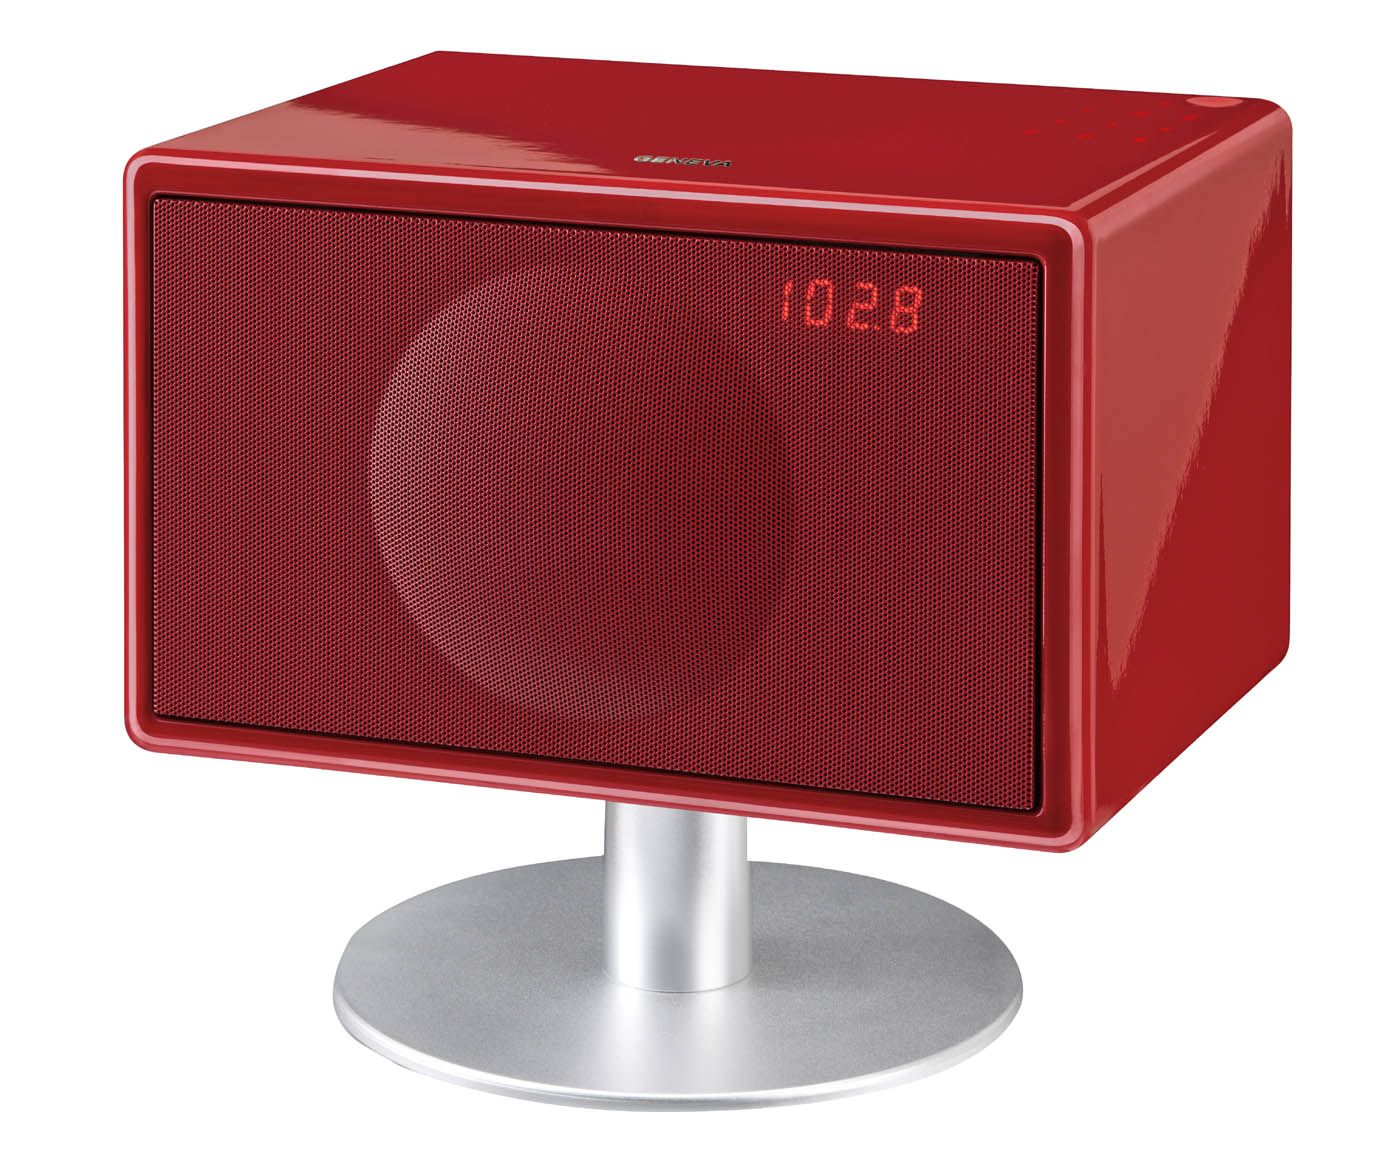 Sistema audio geneva model s wireless rosso high fidelity